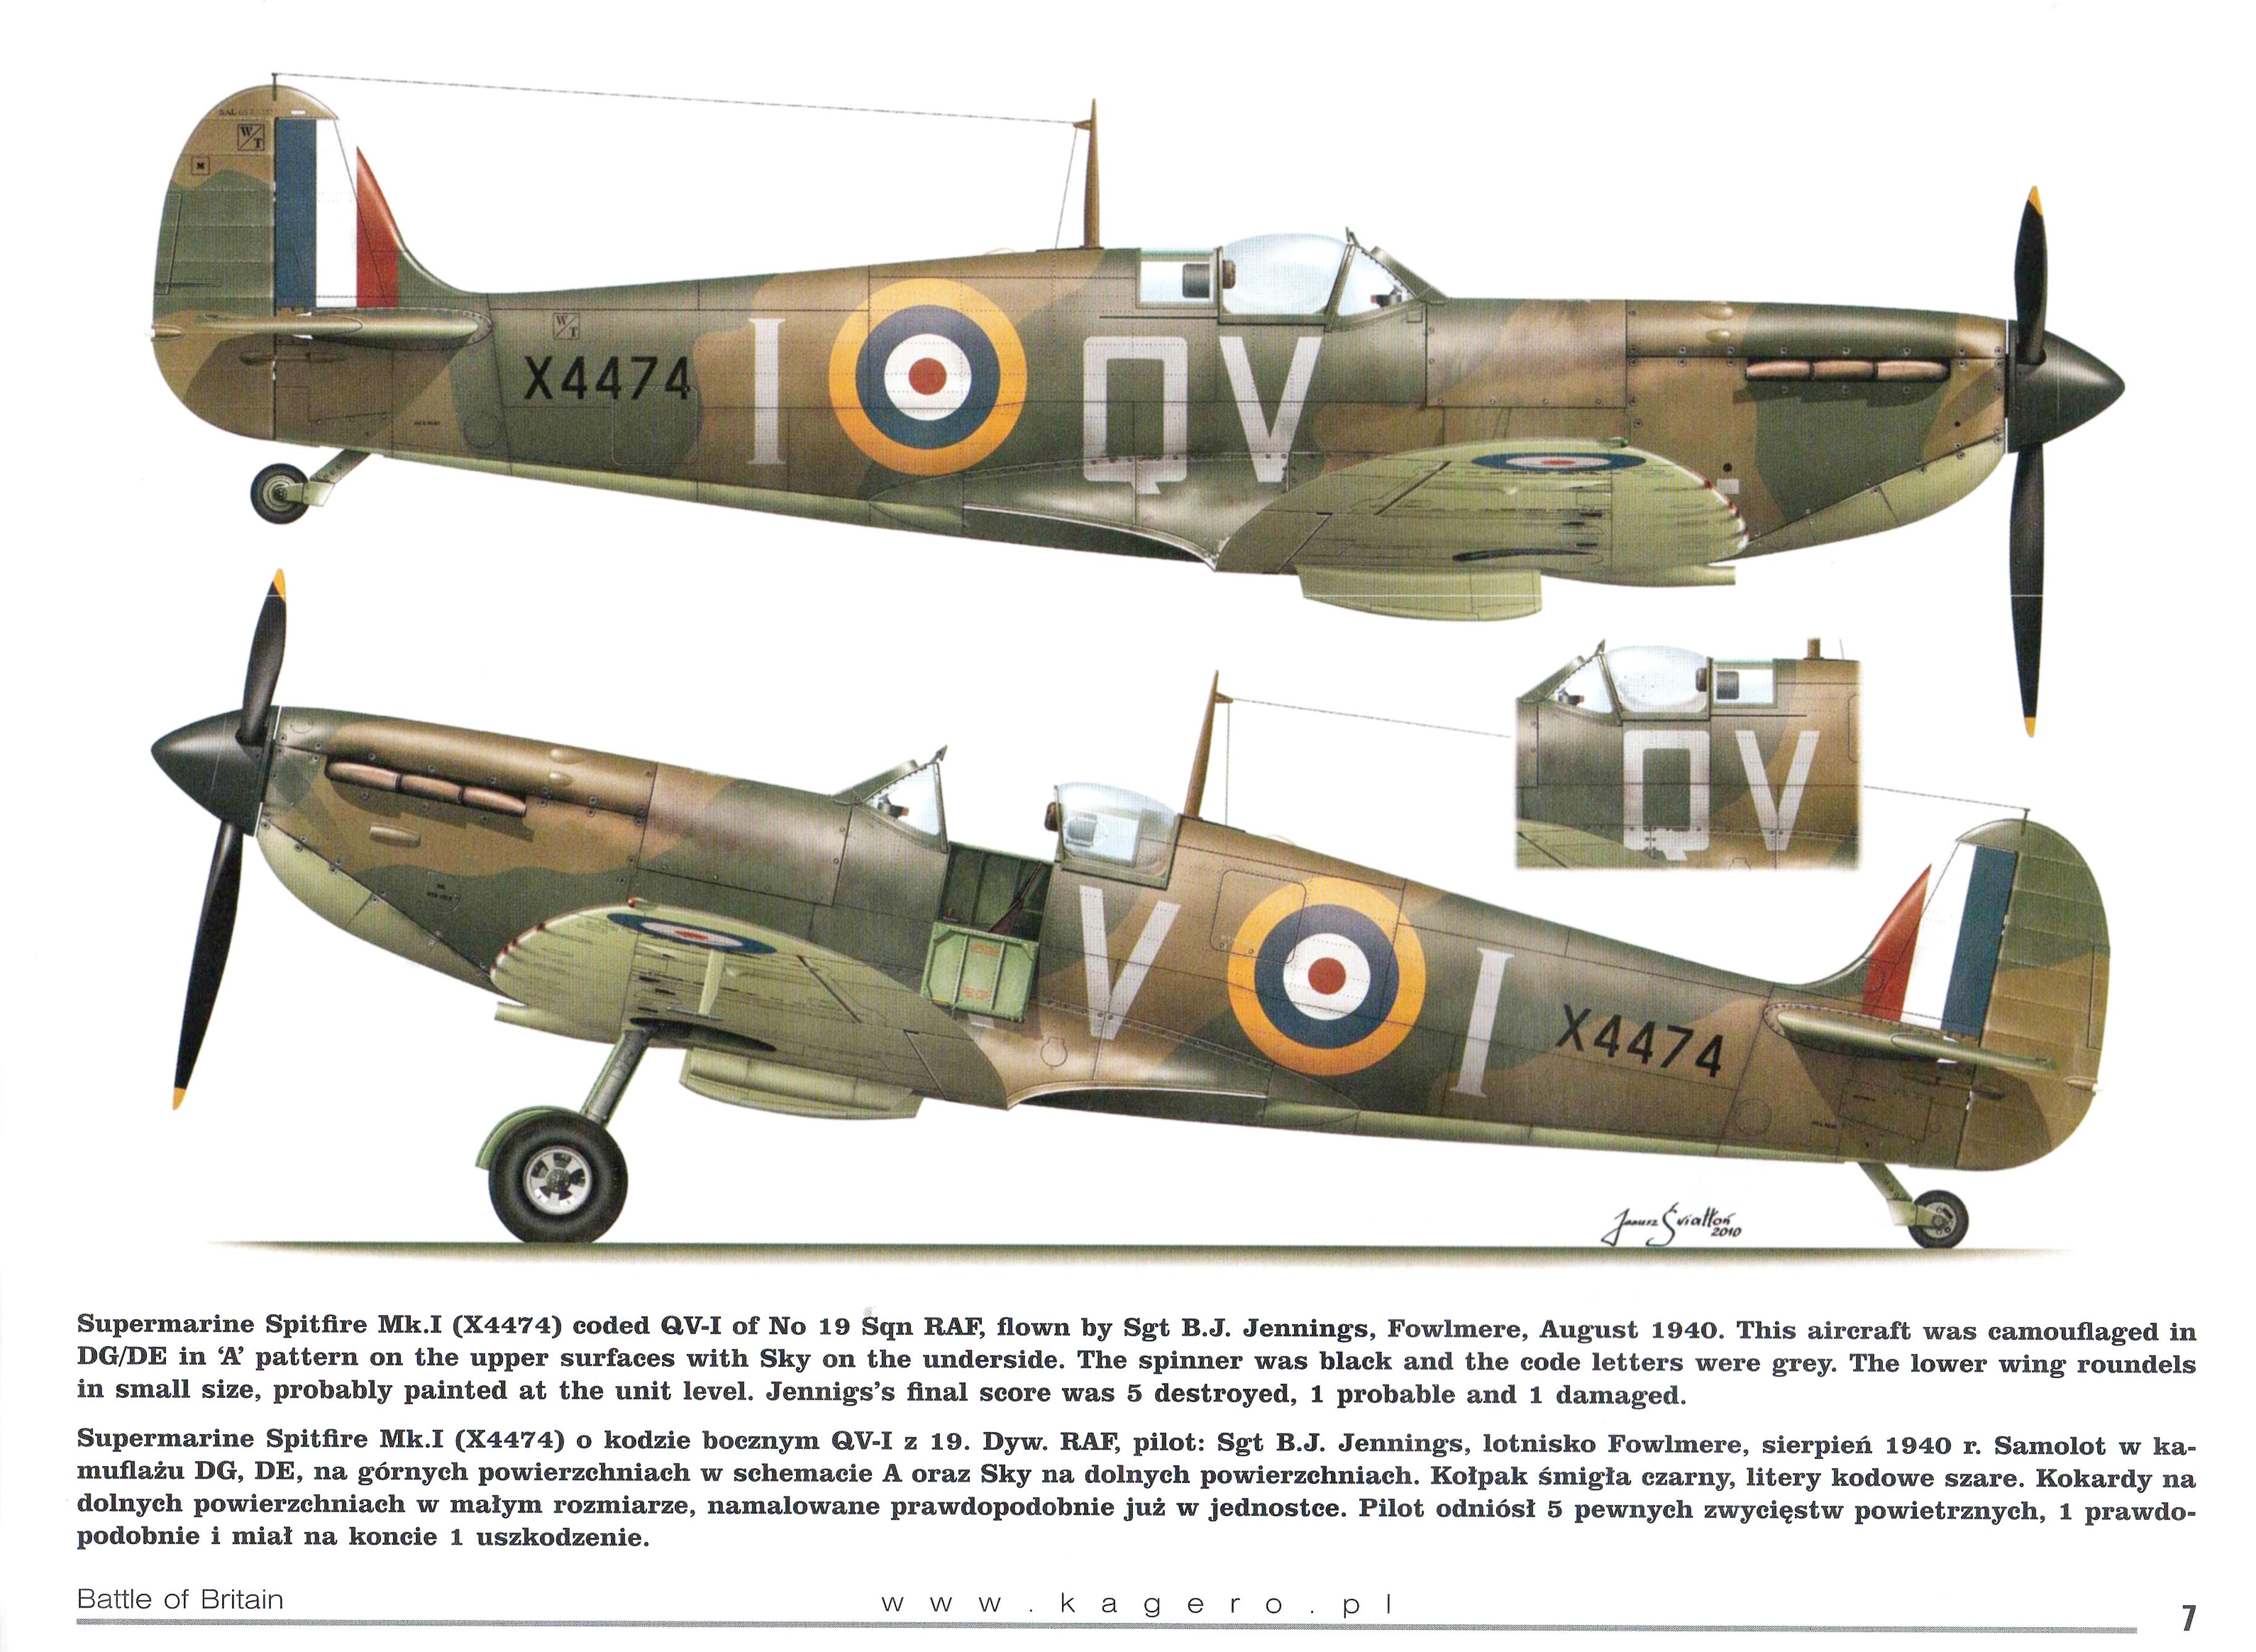 Spitfire MkIa RAF 19Sqn QVI BJ Jennings X4474 TC15016 Battle of Britain Page 06